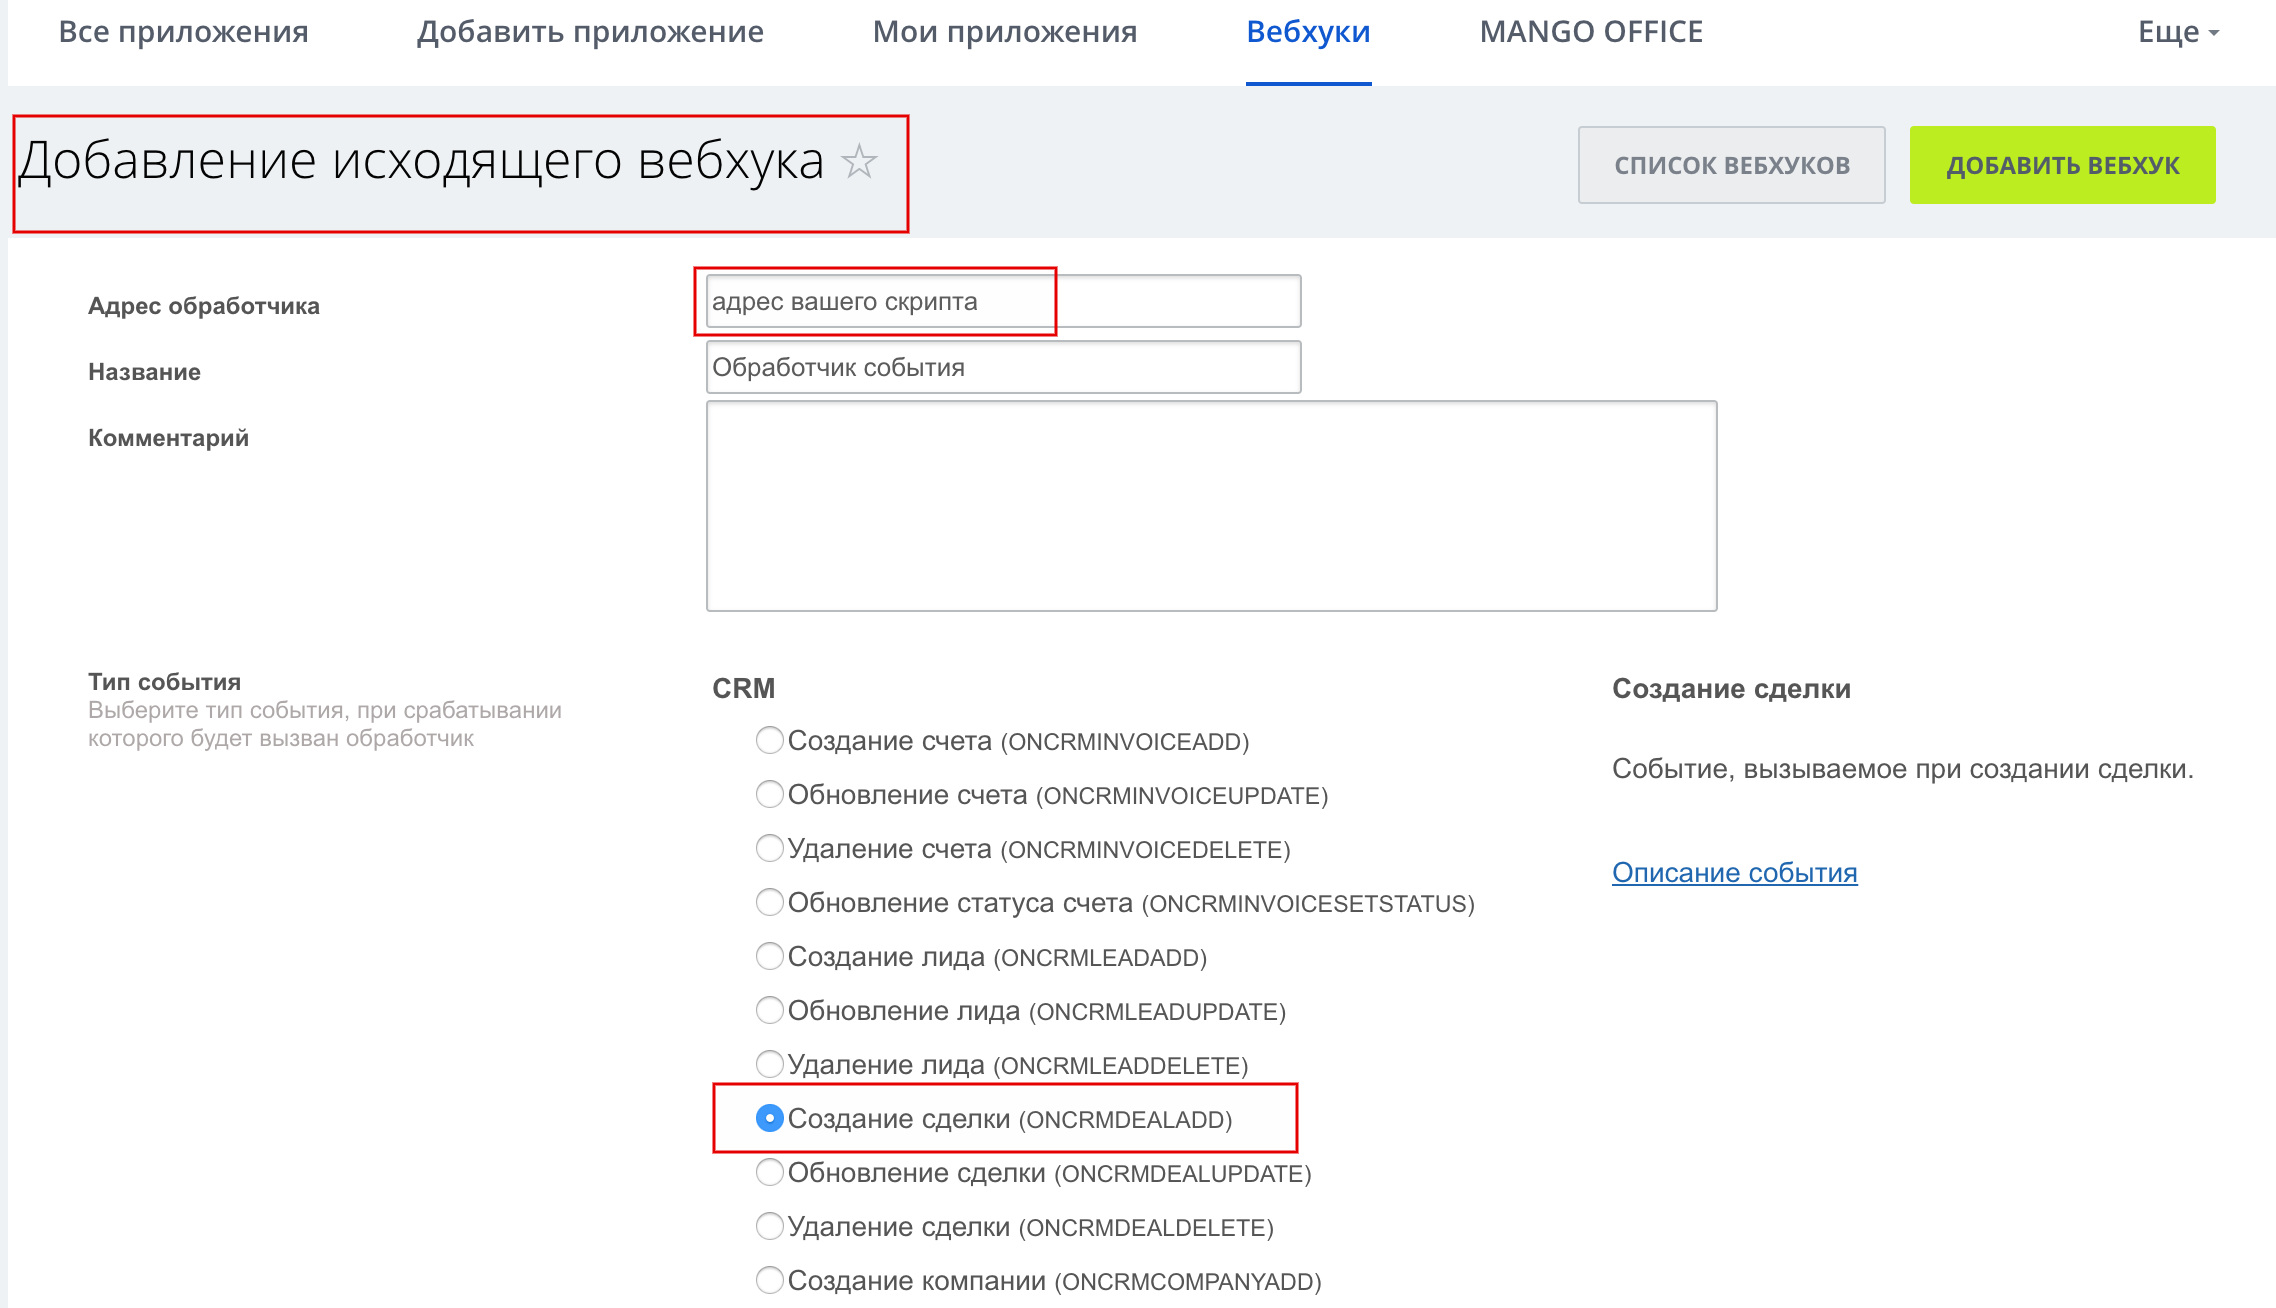 Интеграция с сайтом битрикс amocrm мультисписок